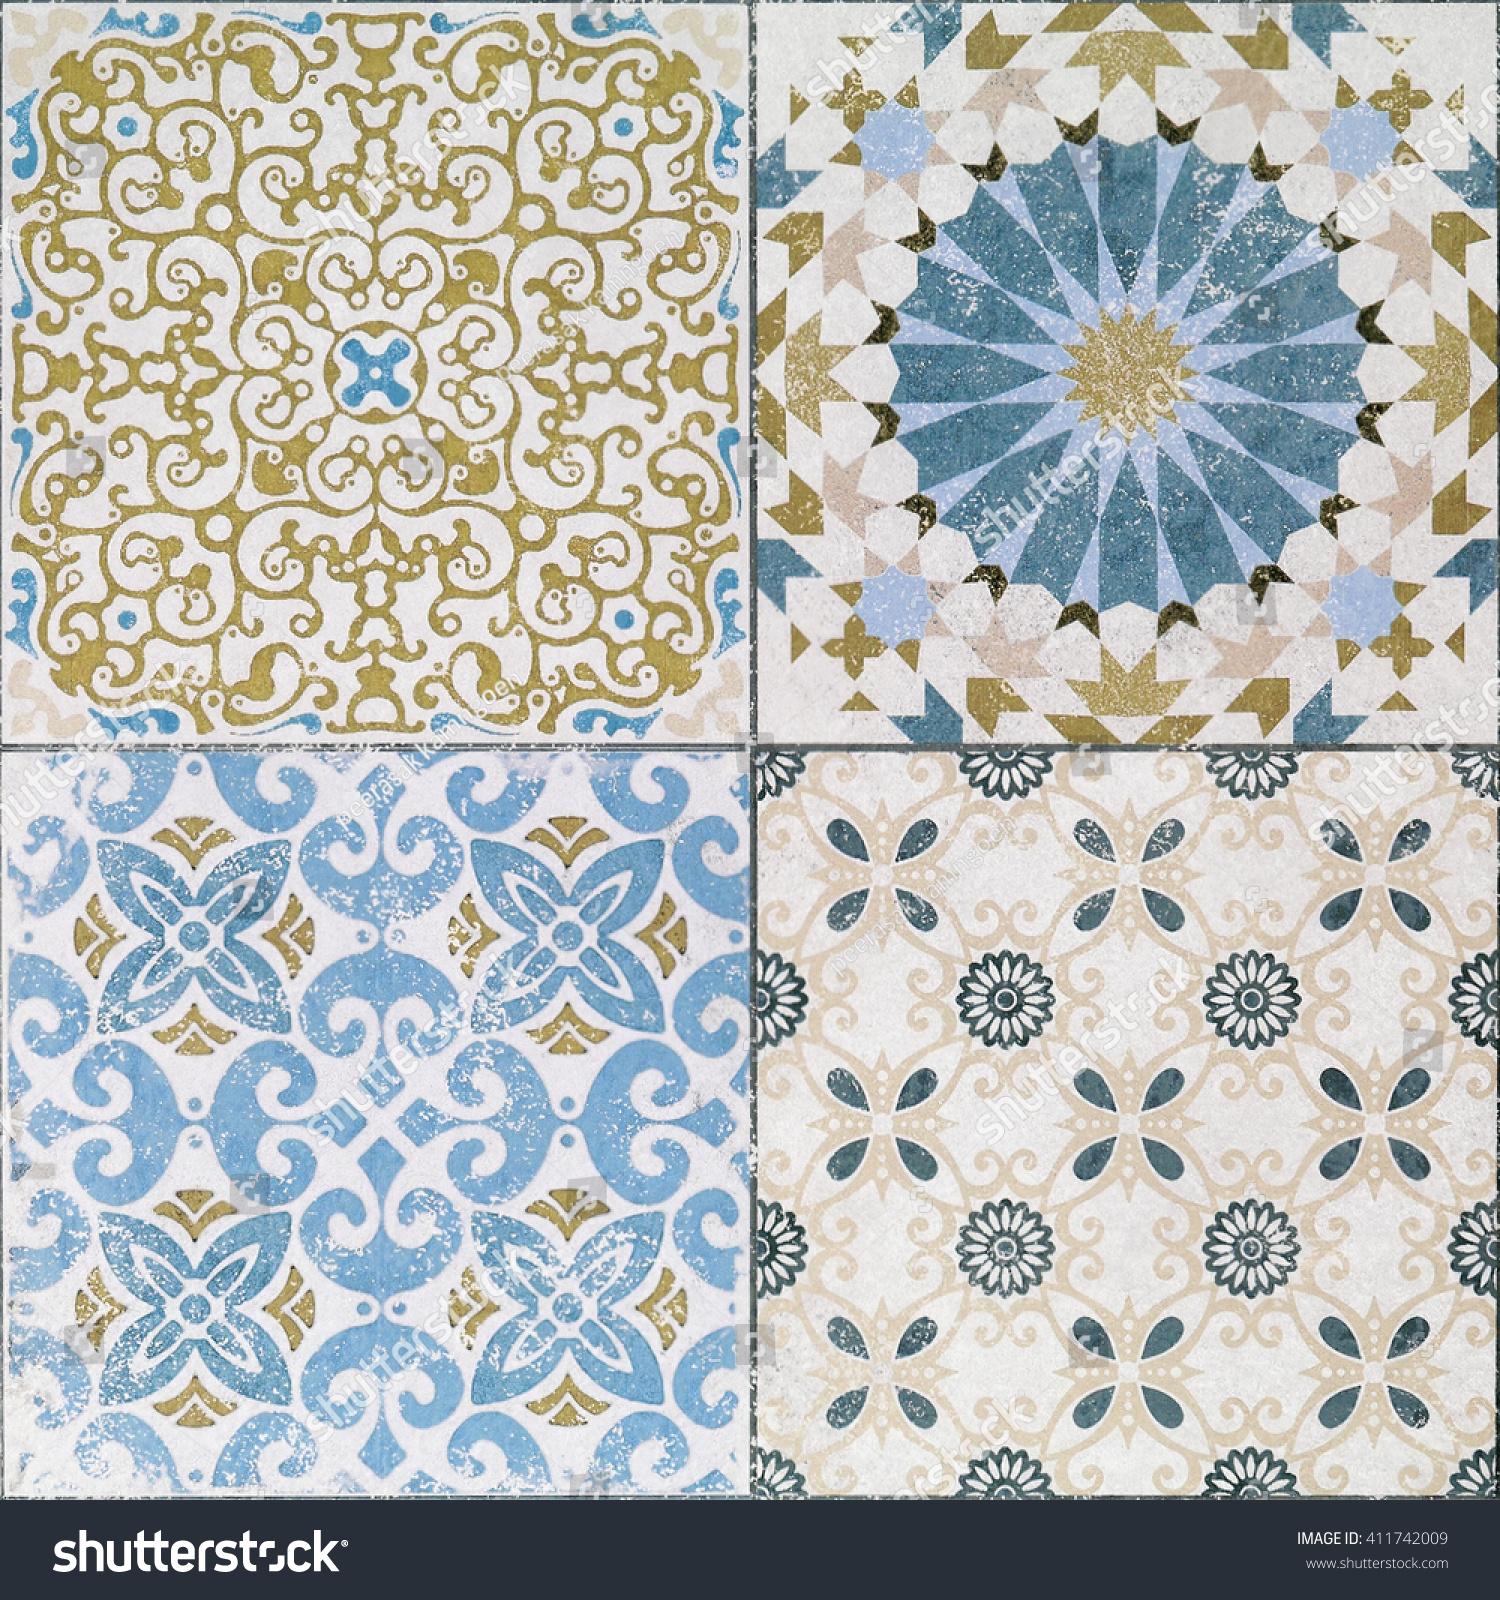 Beautiful old ceramic tiles patterns in the park public.   EZ Canvas